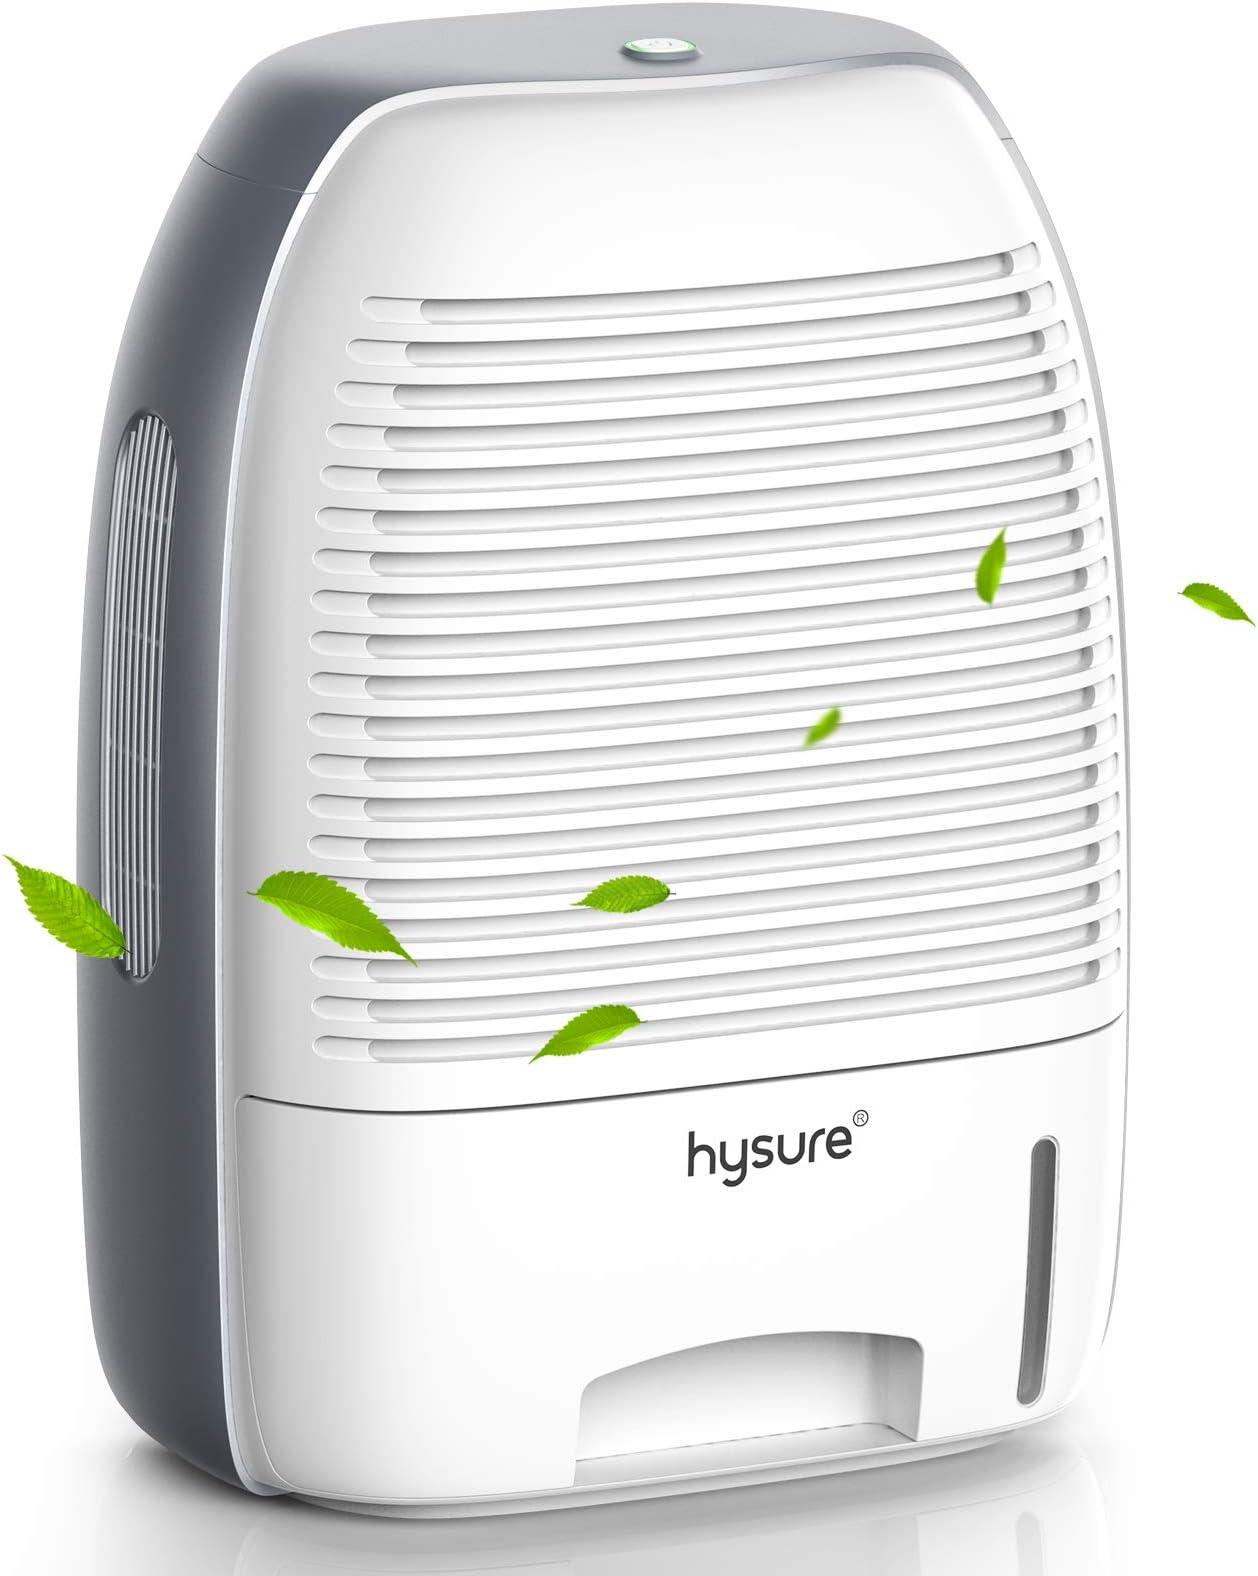 Hysure Dehumidifier for Home 250 sq ft with 52oz(1500ml) Capacity Dehumidifier for Bedroom, Bathroom, RV, Baby Room